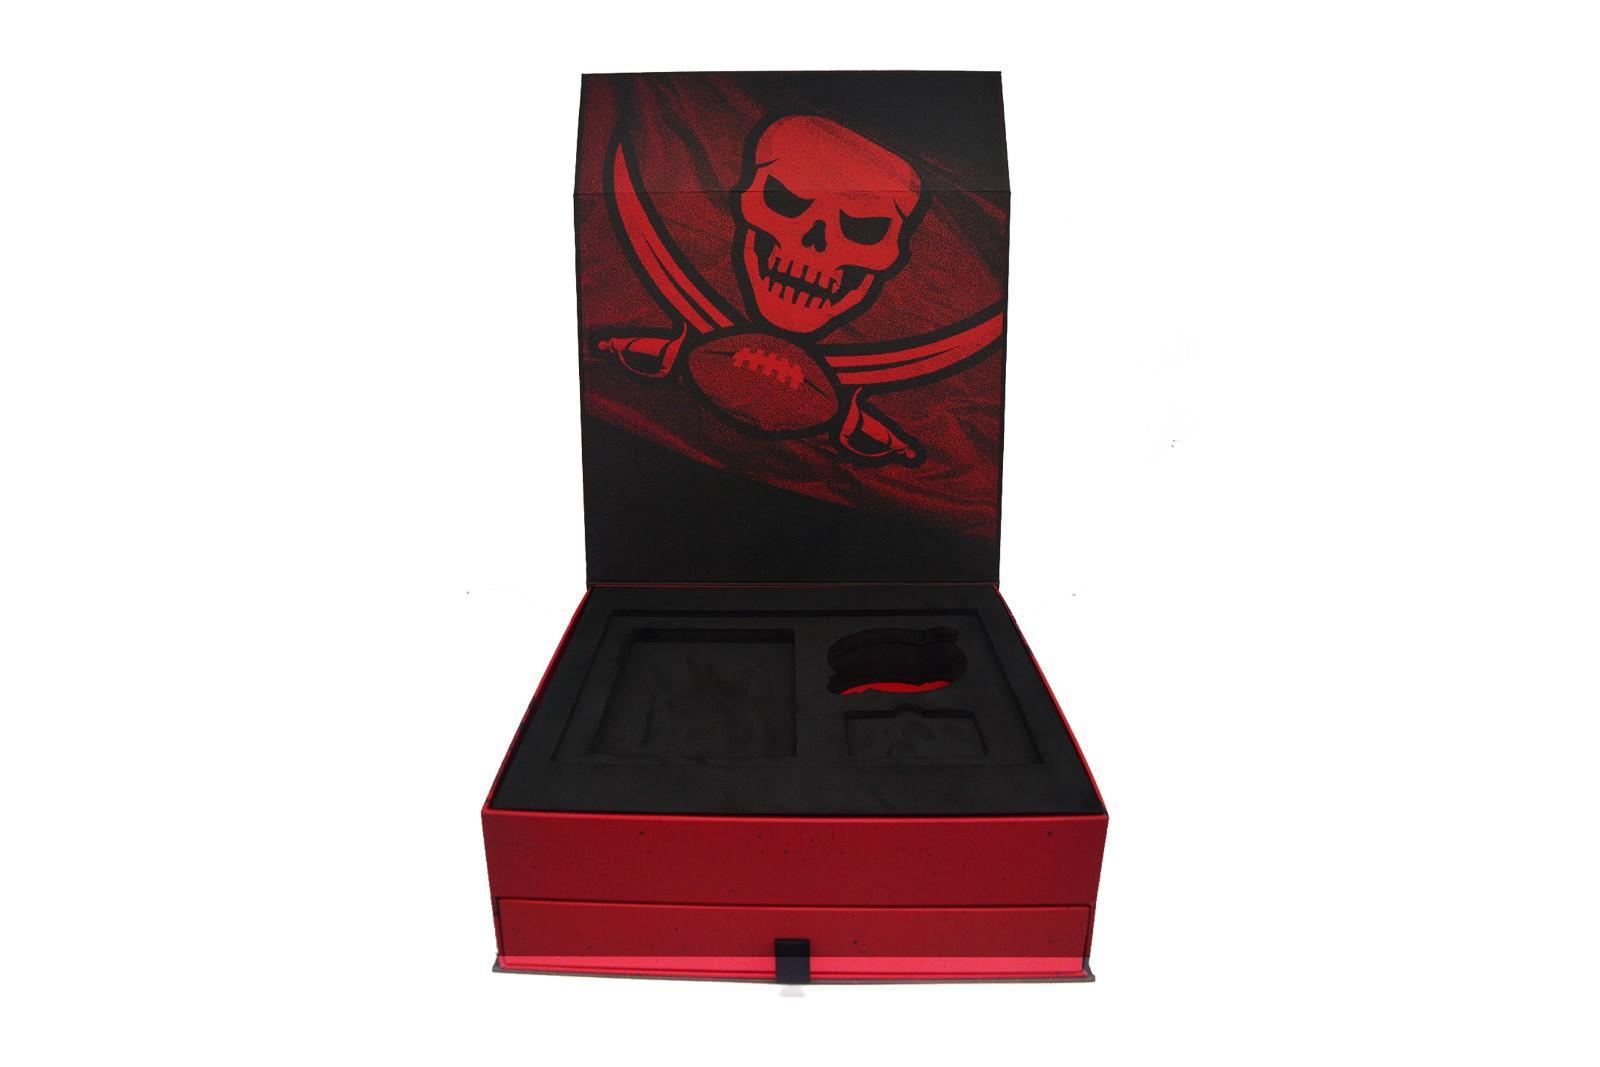 glod birthday gift box directly sale for phone